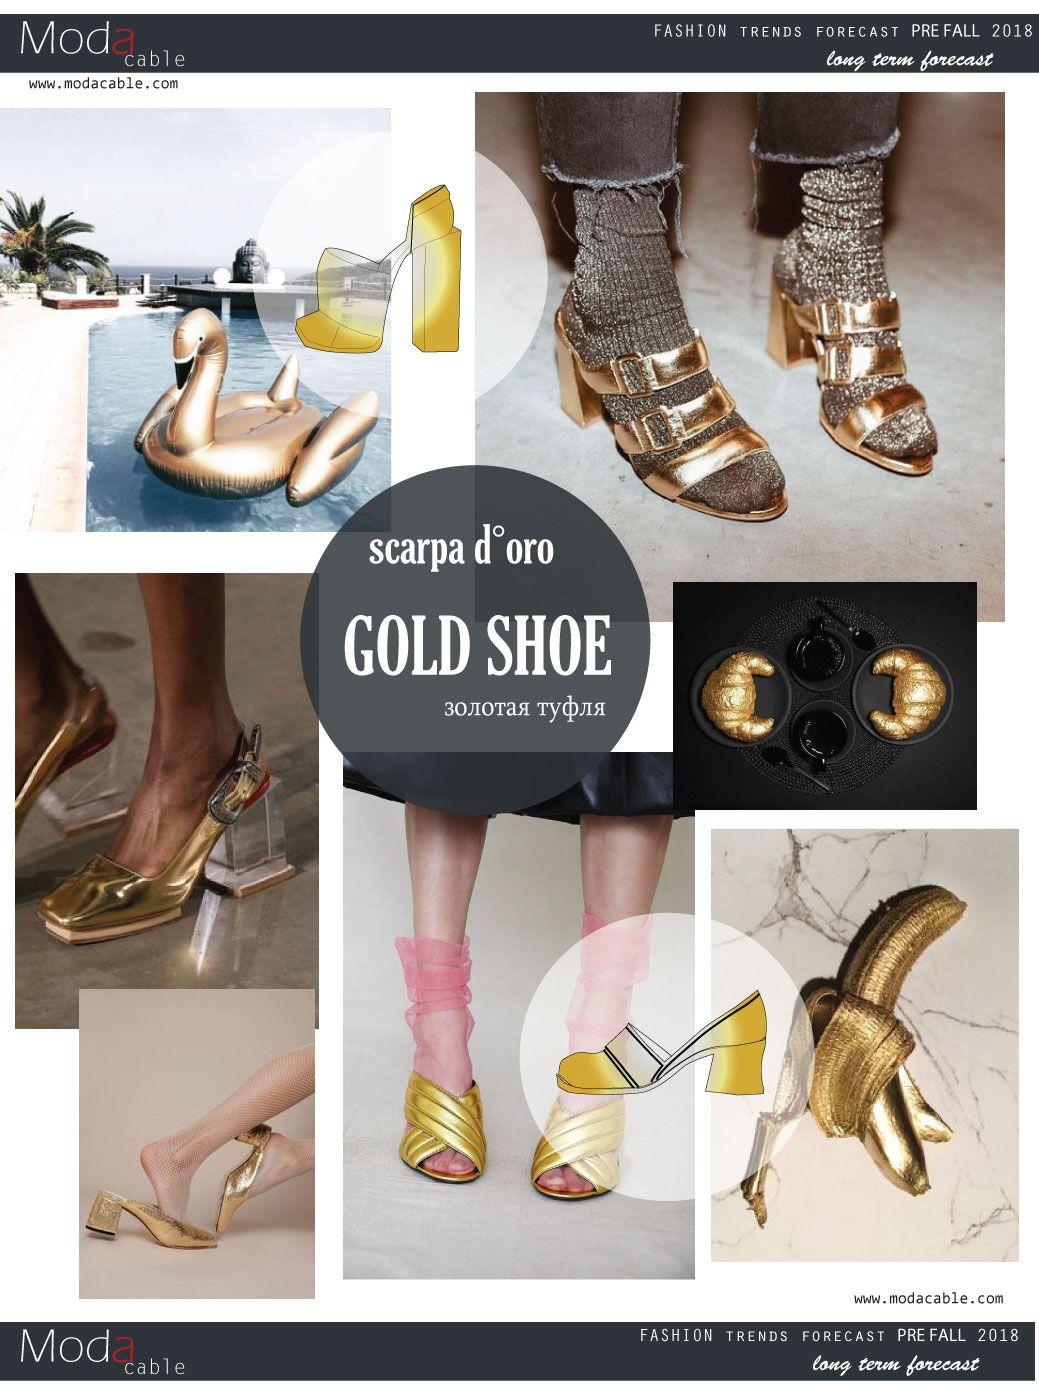 Pre fall 2018 gold shoe